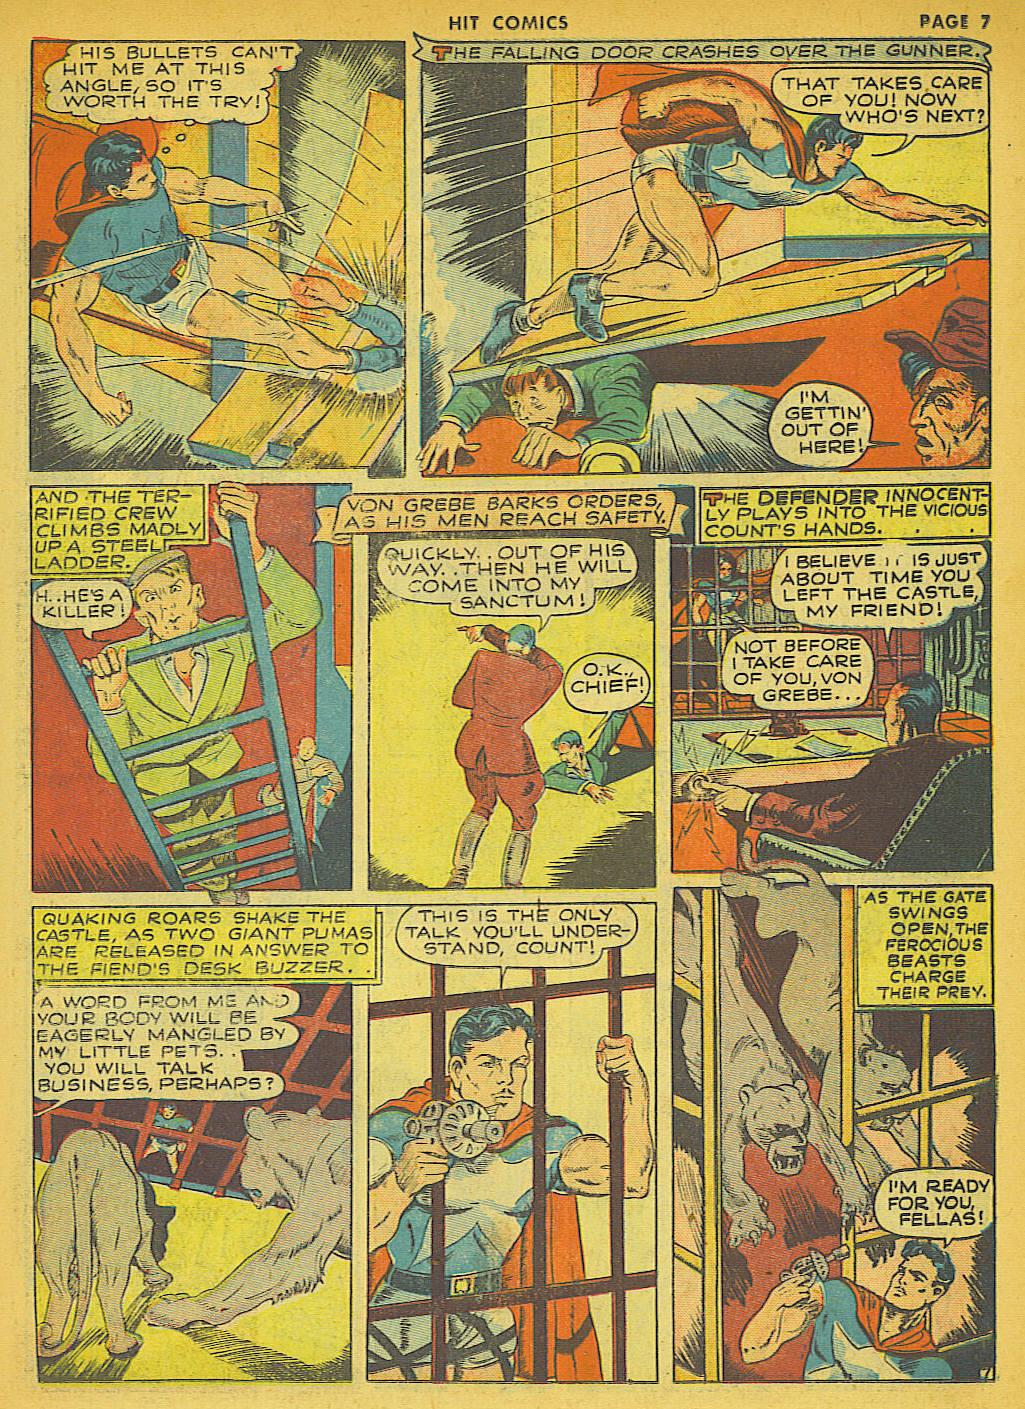 Read online Hit Comics comic -  Issue #21 - 9